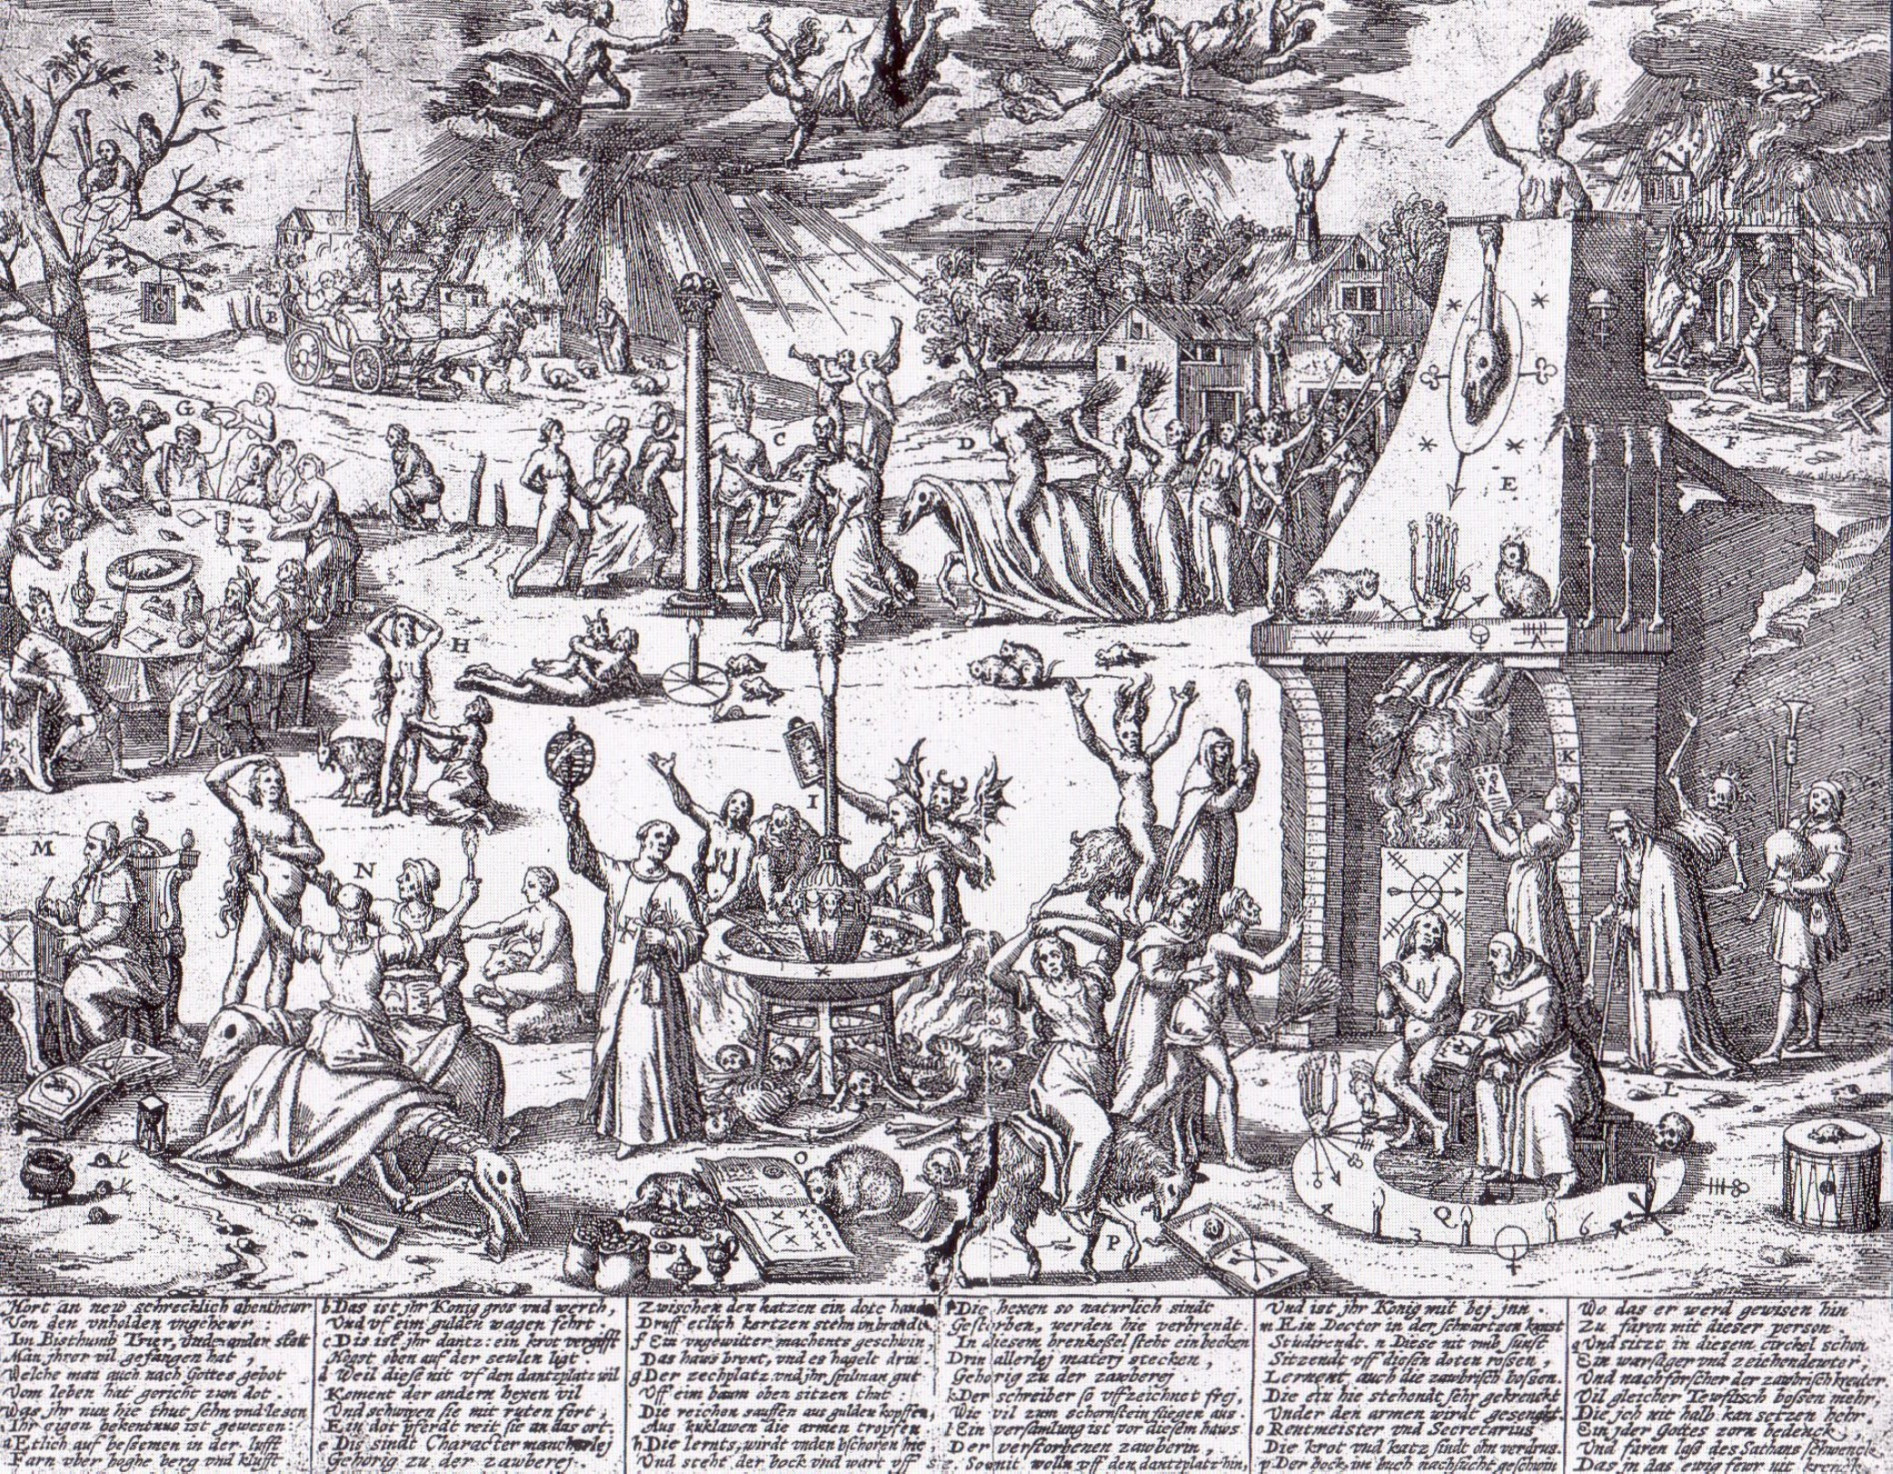 Trier, 1594. Hexentanzplatz